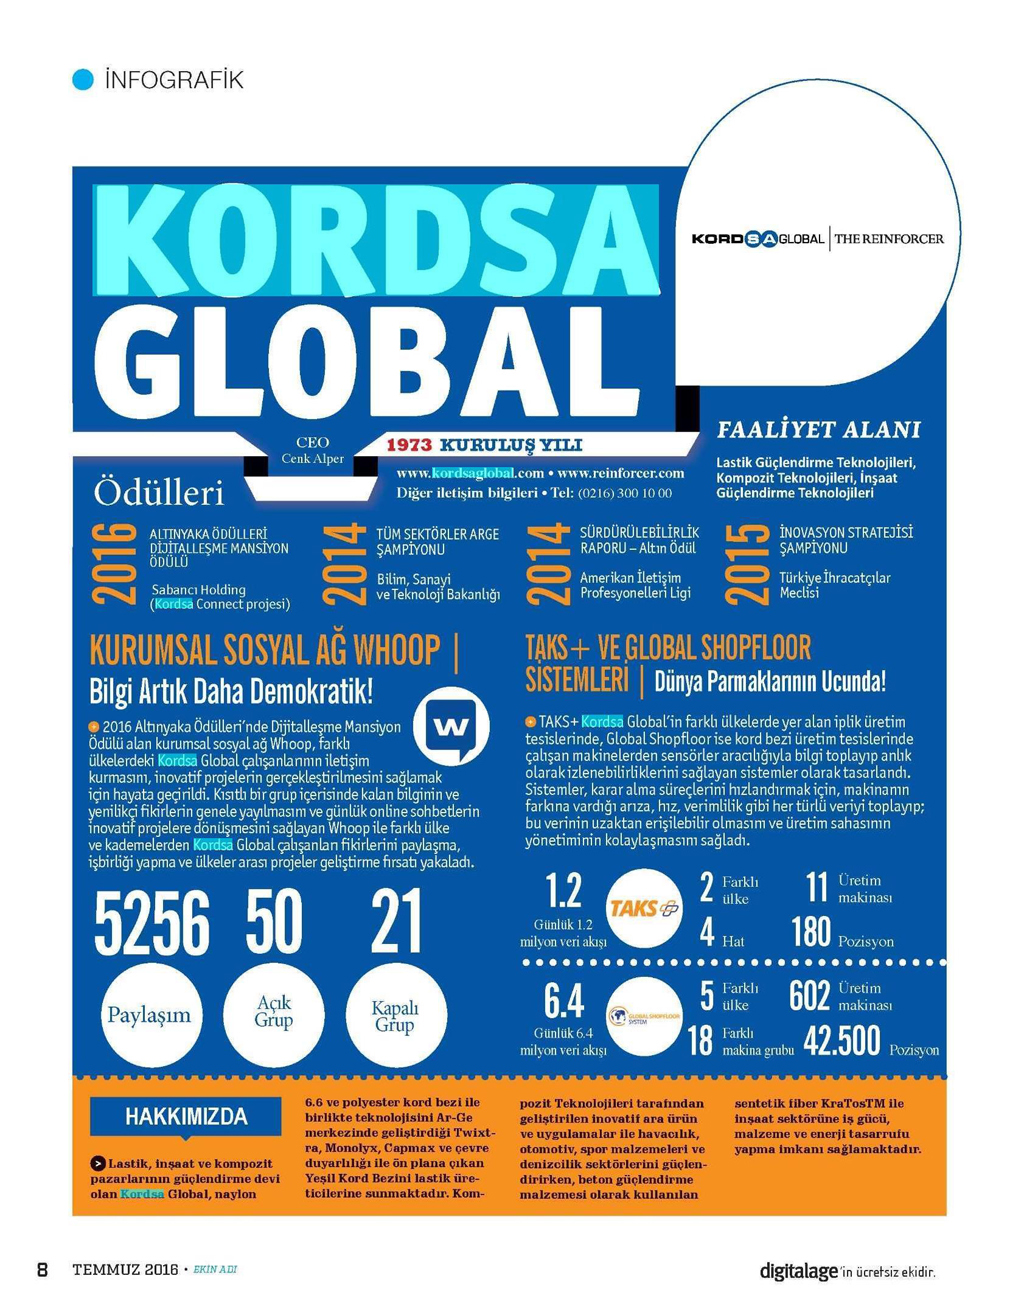 Kordsa Digital Age Infographic